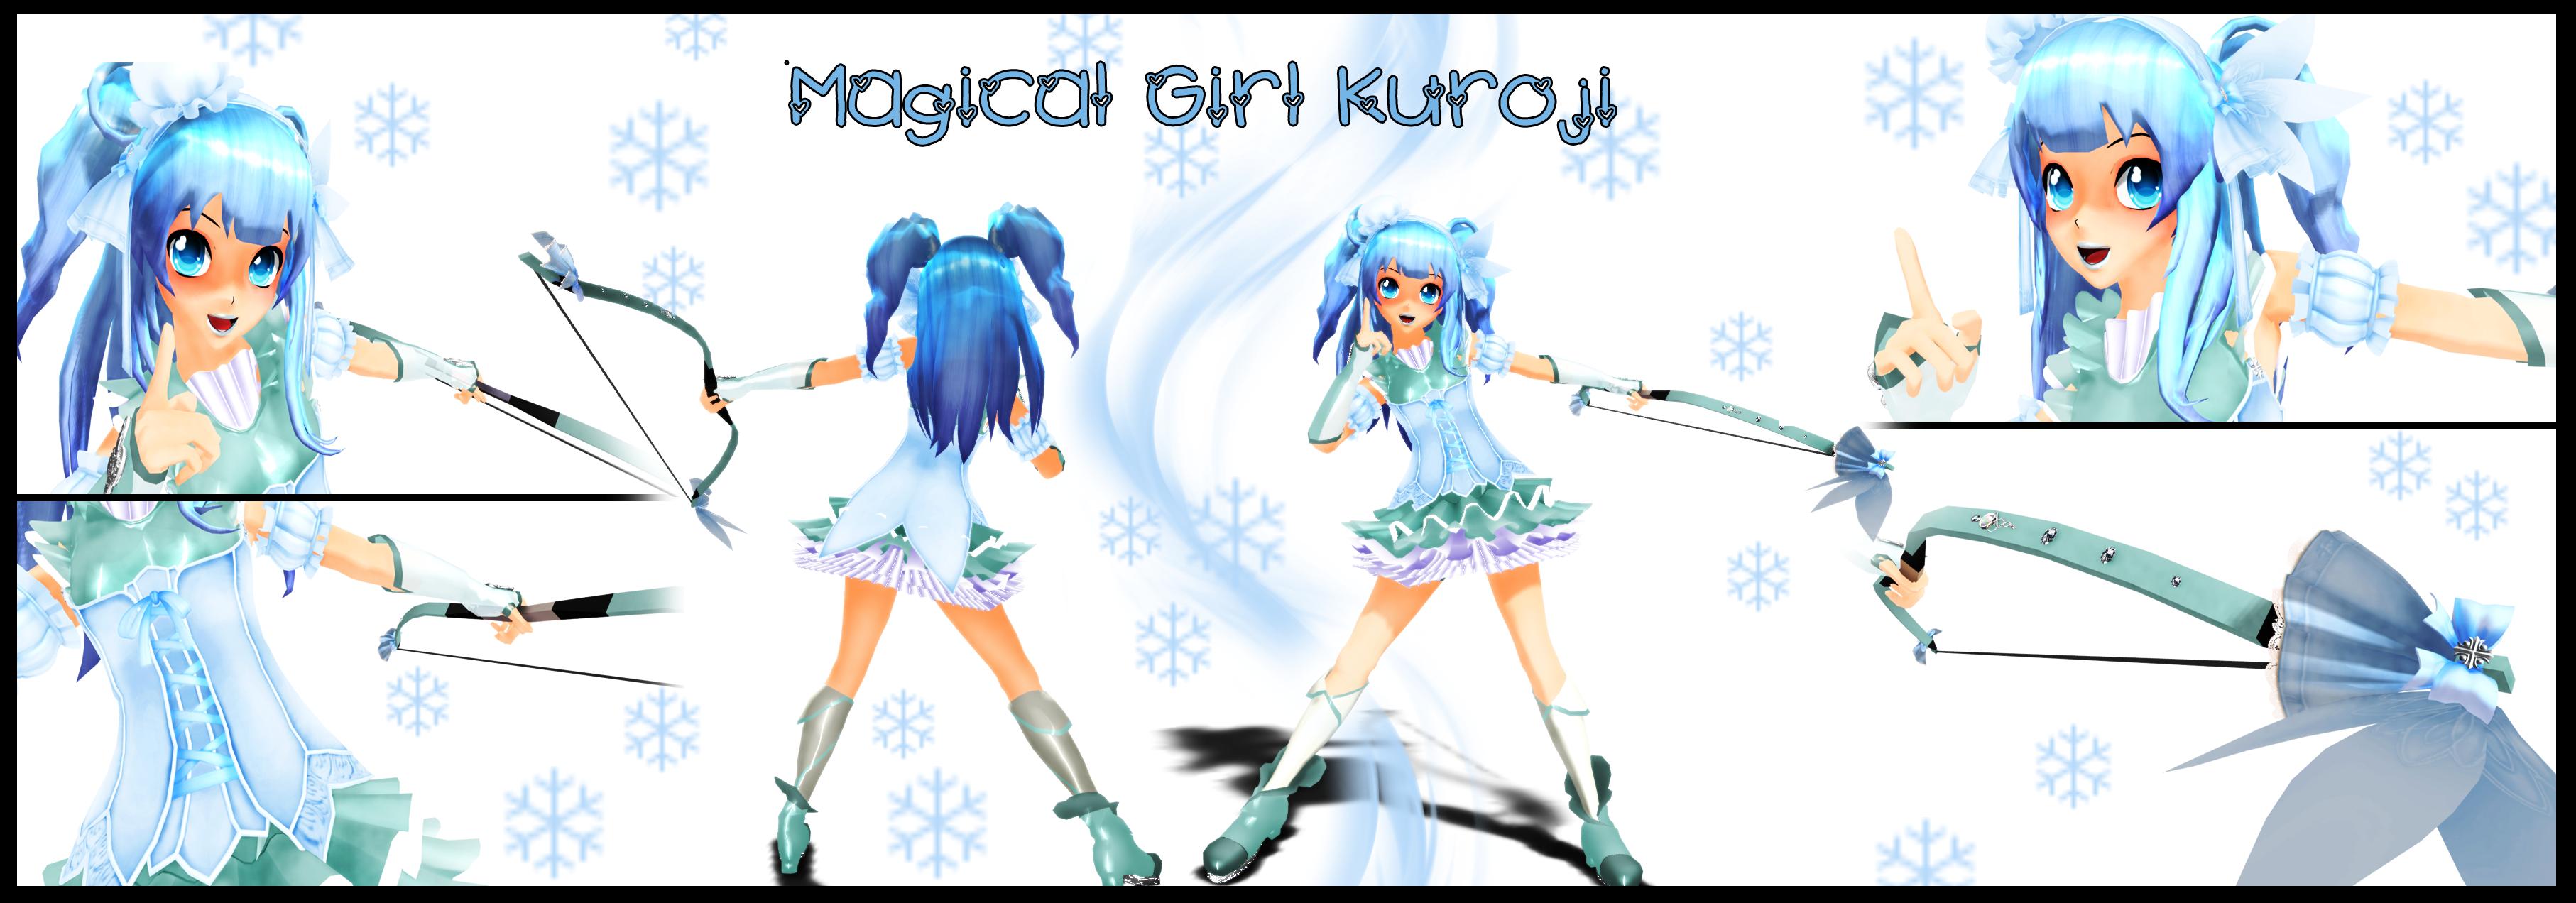 . : MOTME: Magical Girl Kuroji : . by Majikaru-Rin